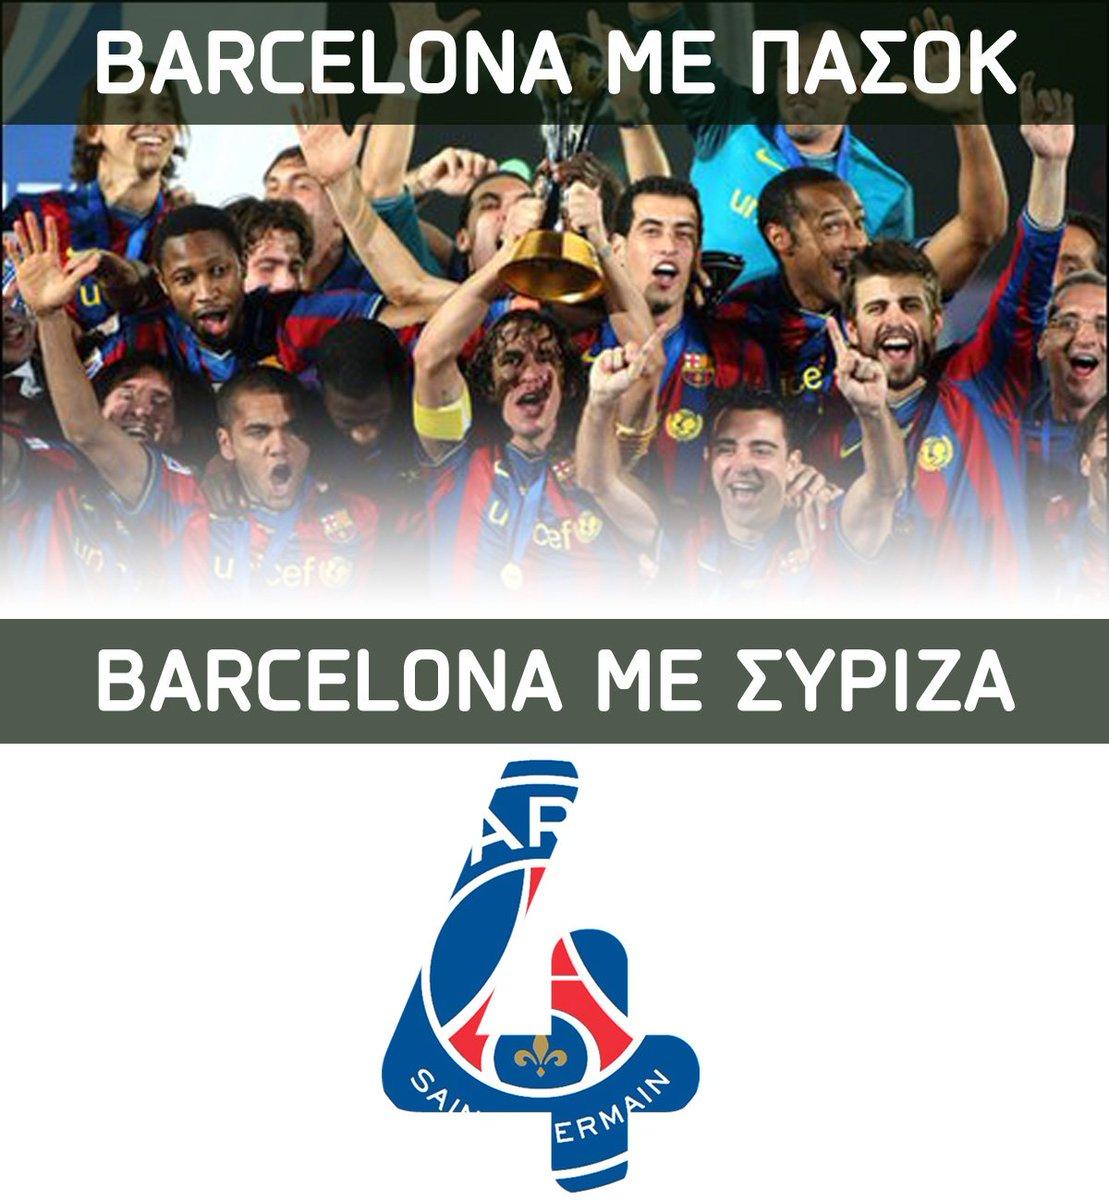 #PSGFCB: PSGFCB